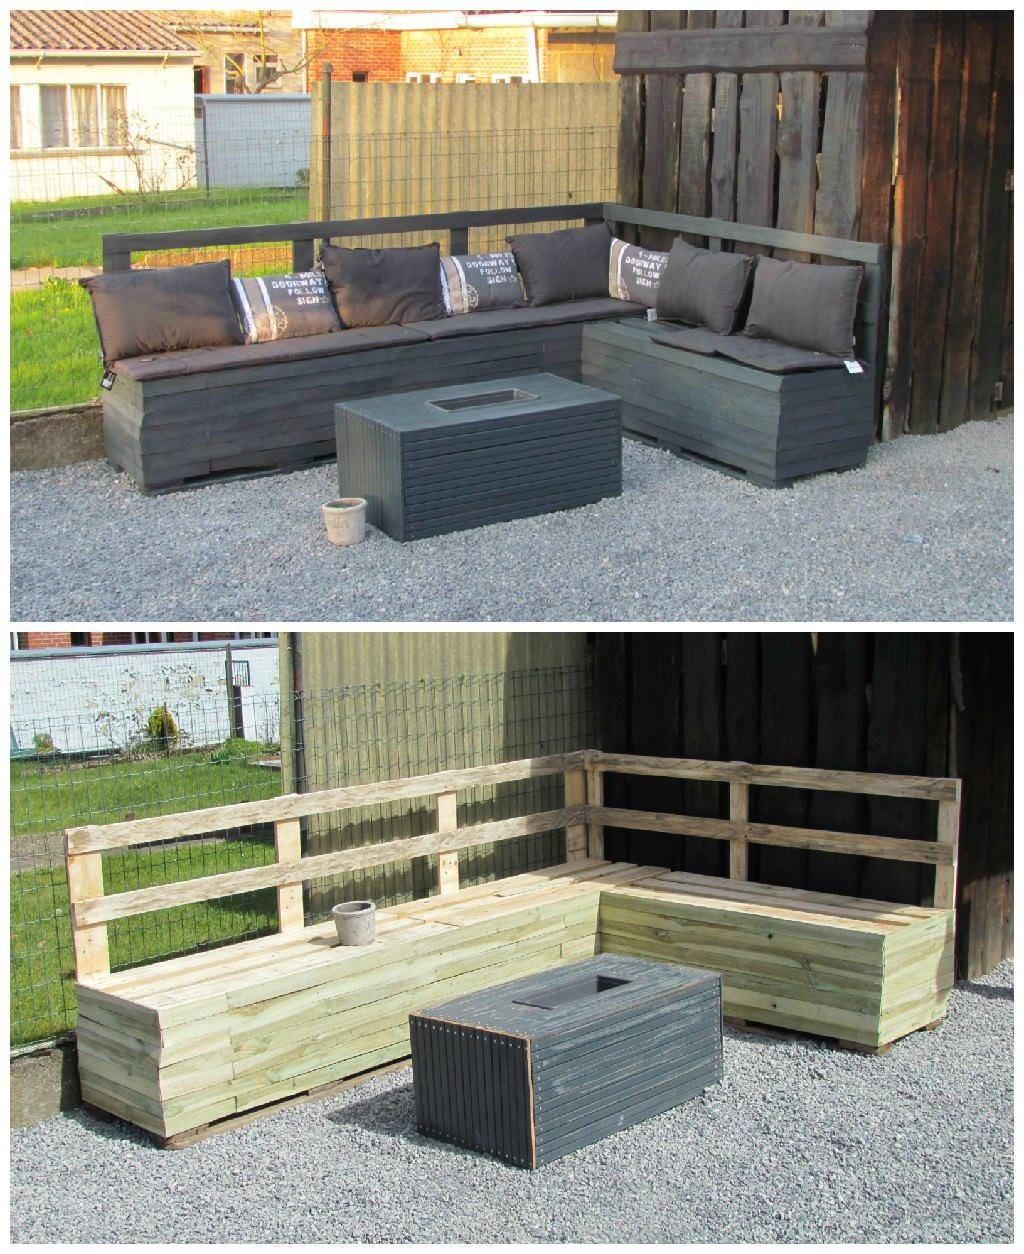 Pallet Garden Sofa | Garden sofa, Pallets garden and Pallets